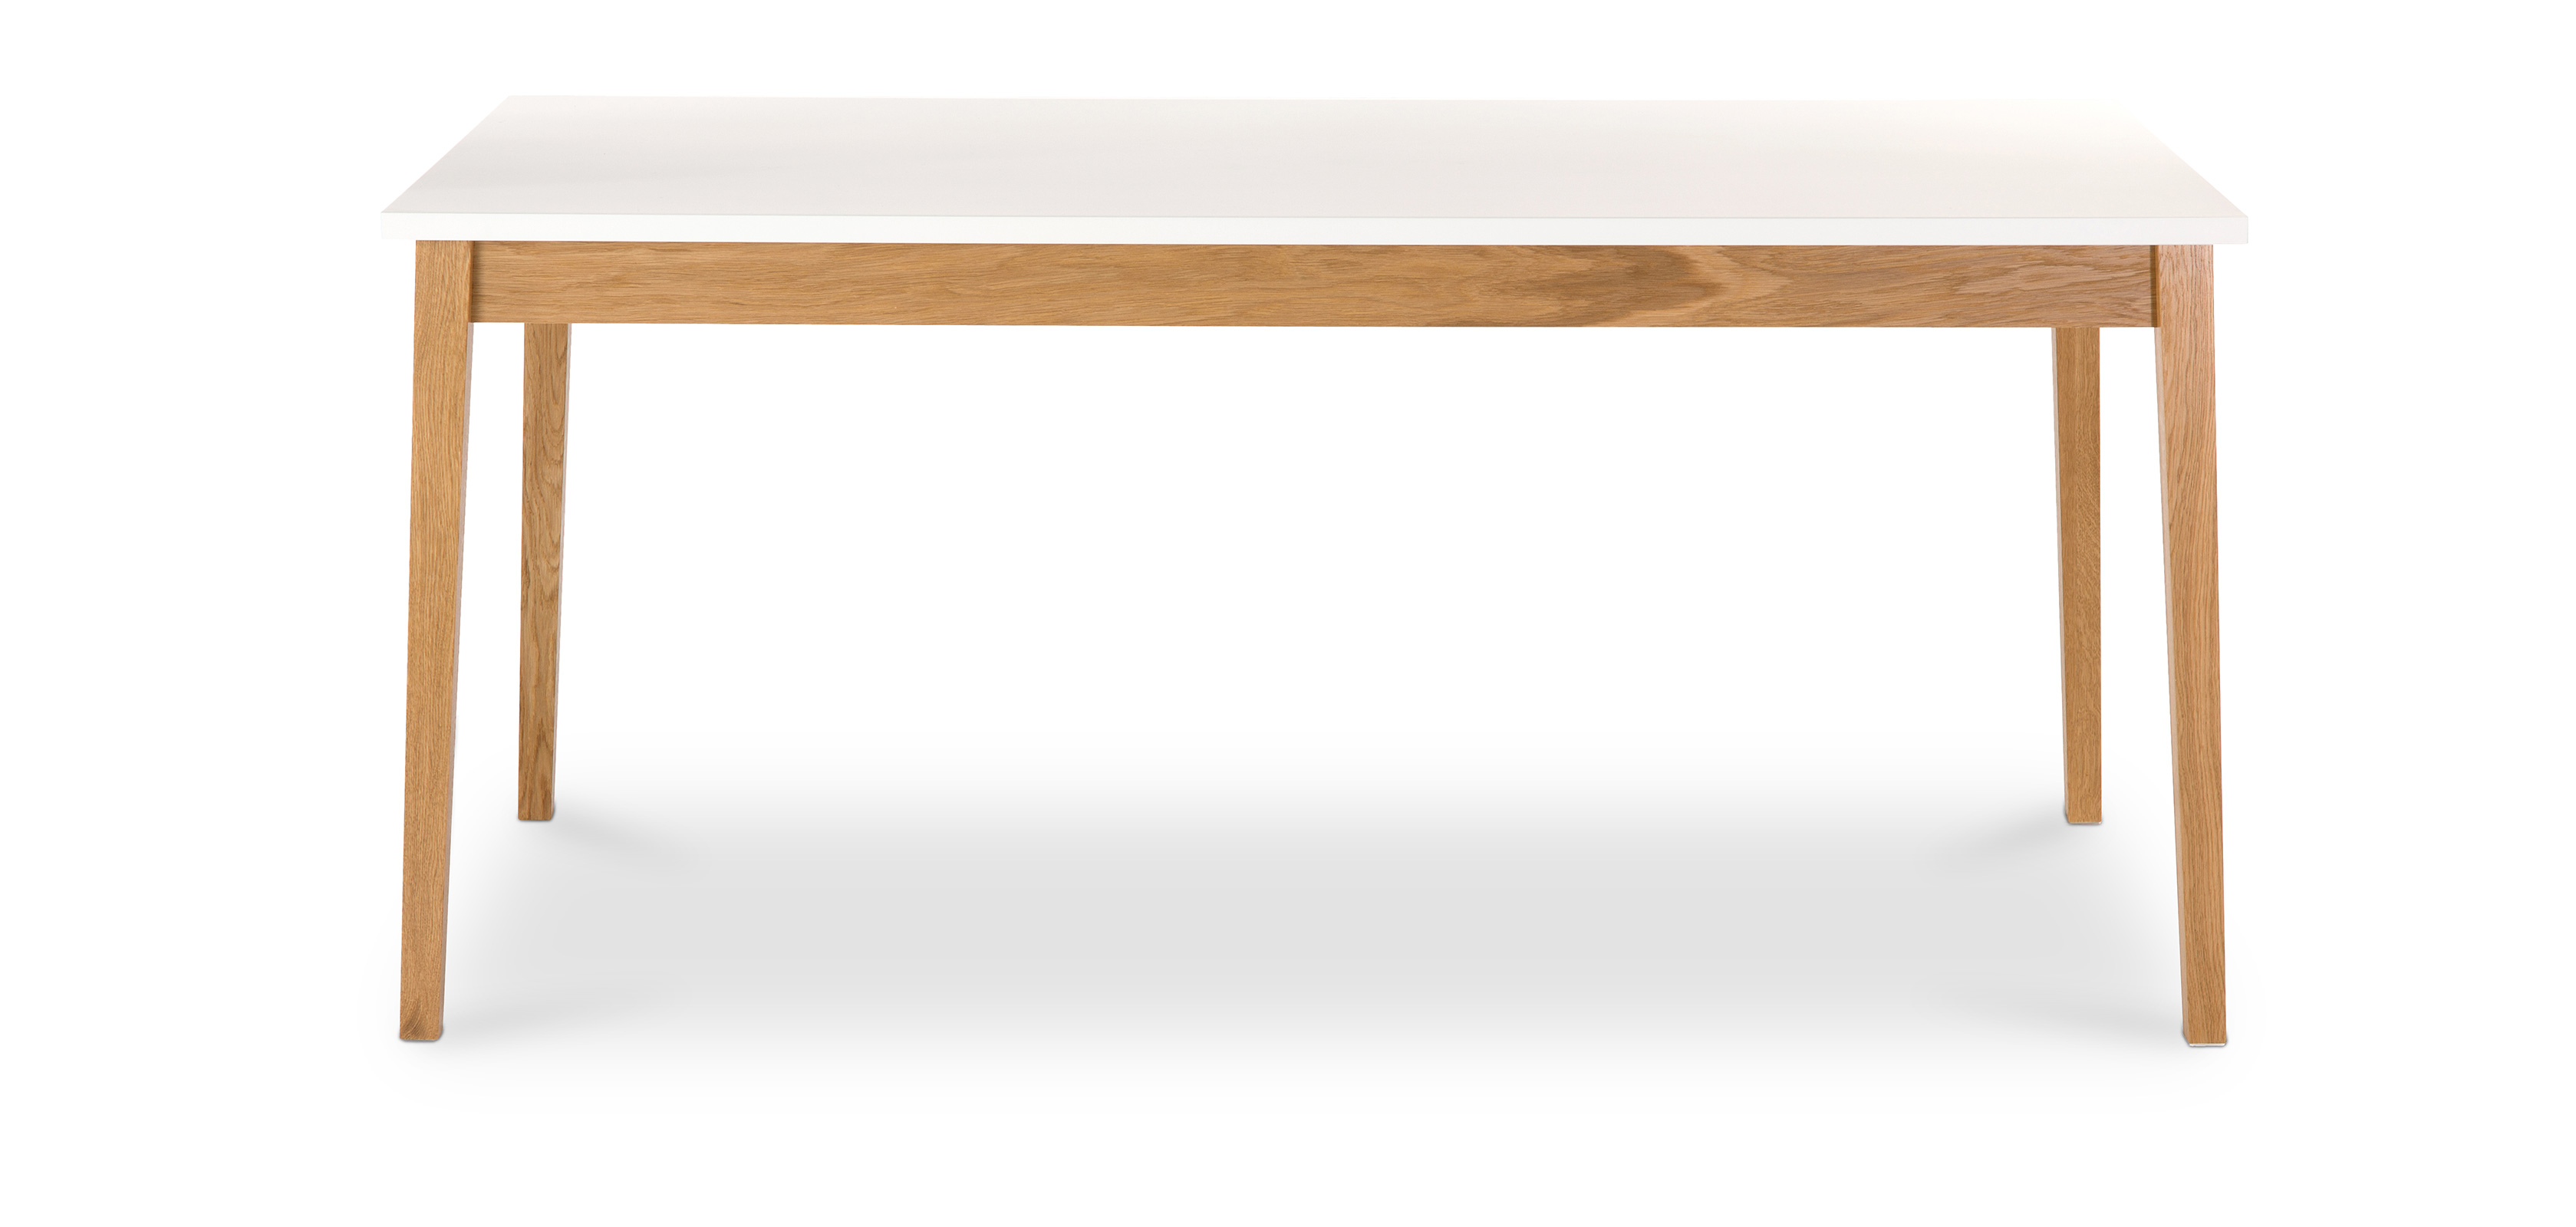 Table de salle manger de style scandinave miurem - Table salle a manger style scandinave ...